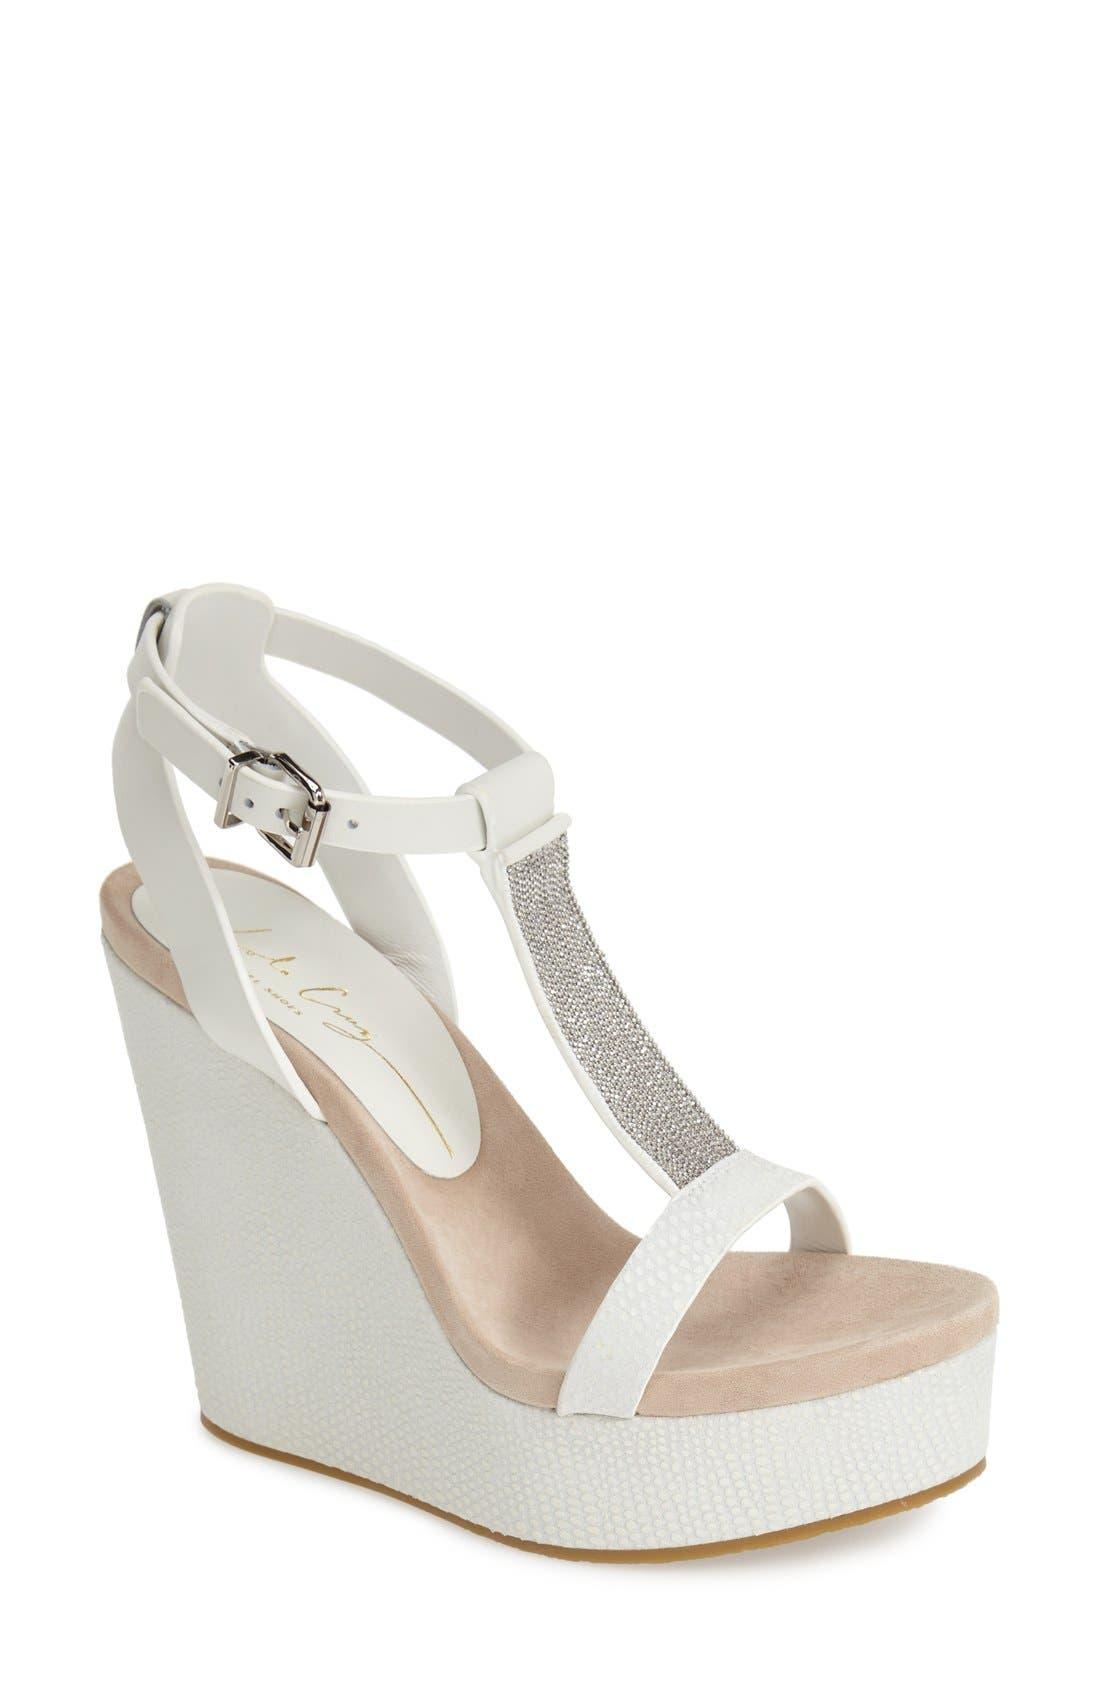 Main Image - Lola Cruz Chain T-Strap Wedge Sandal (Women)